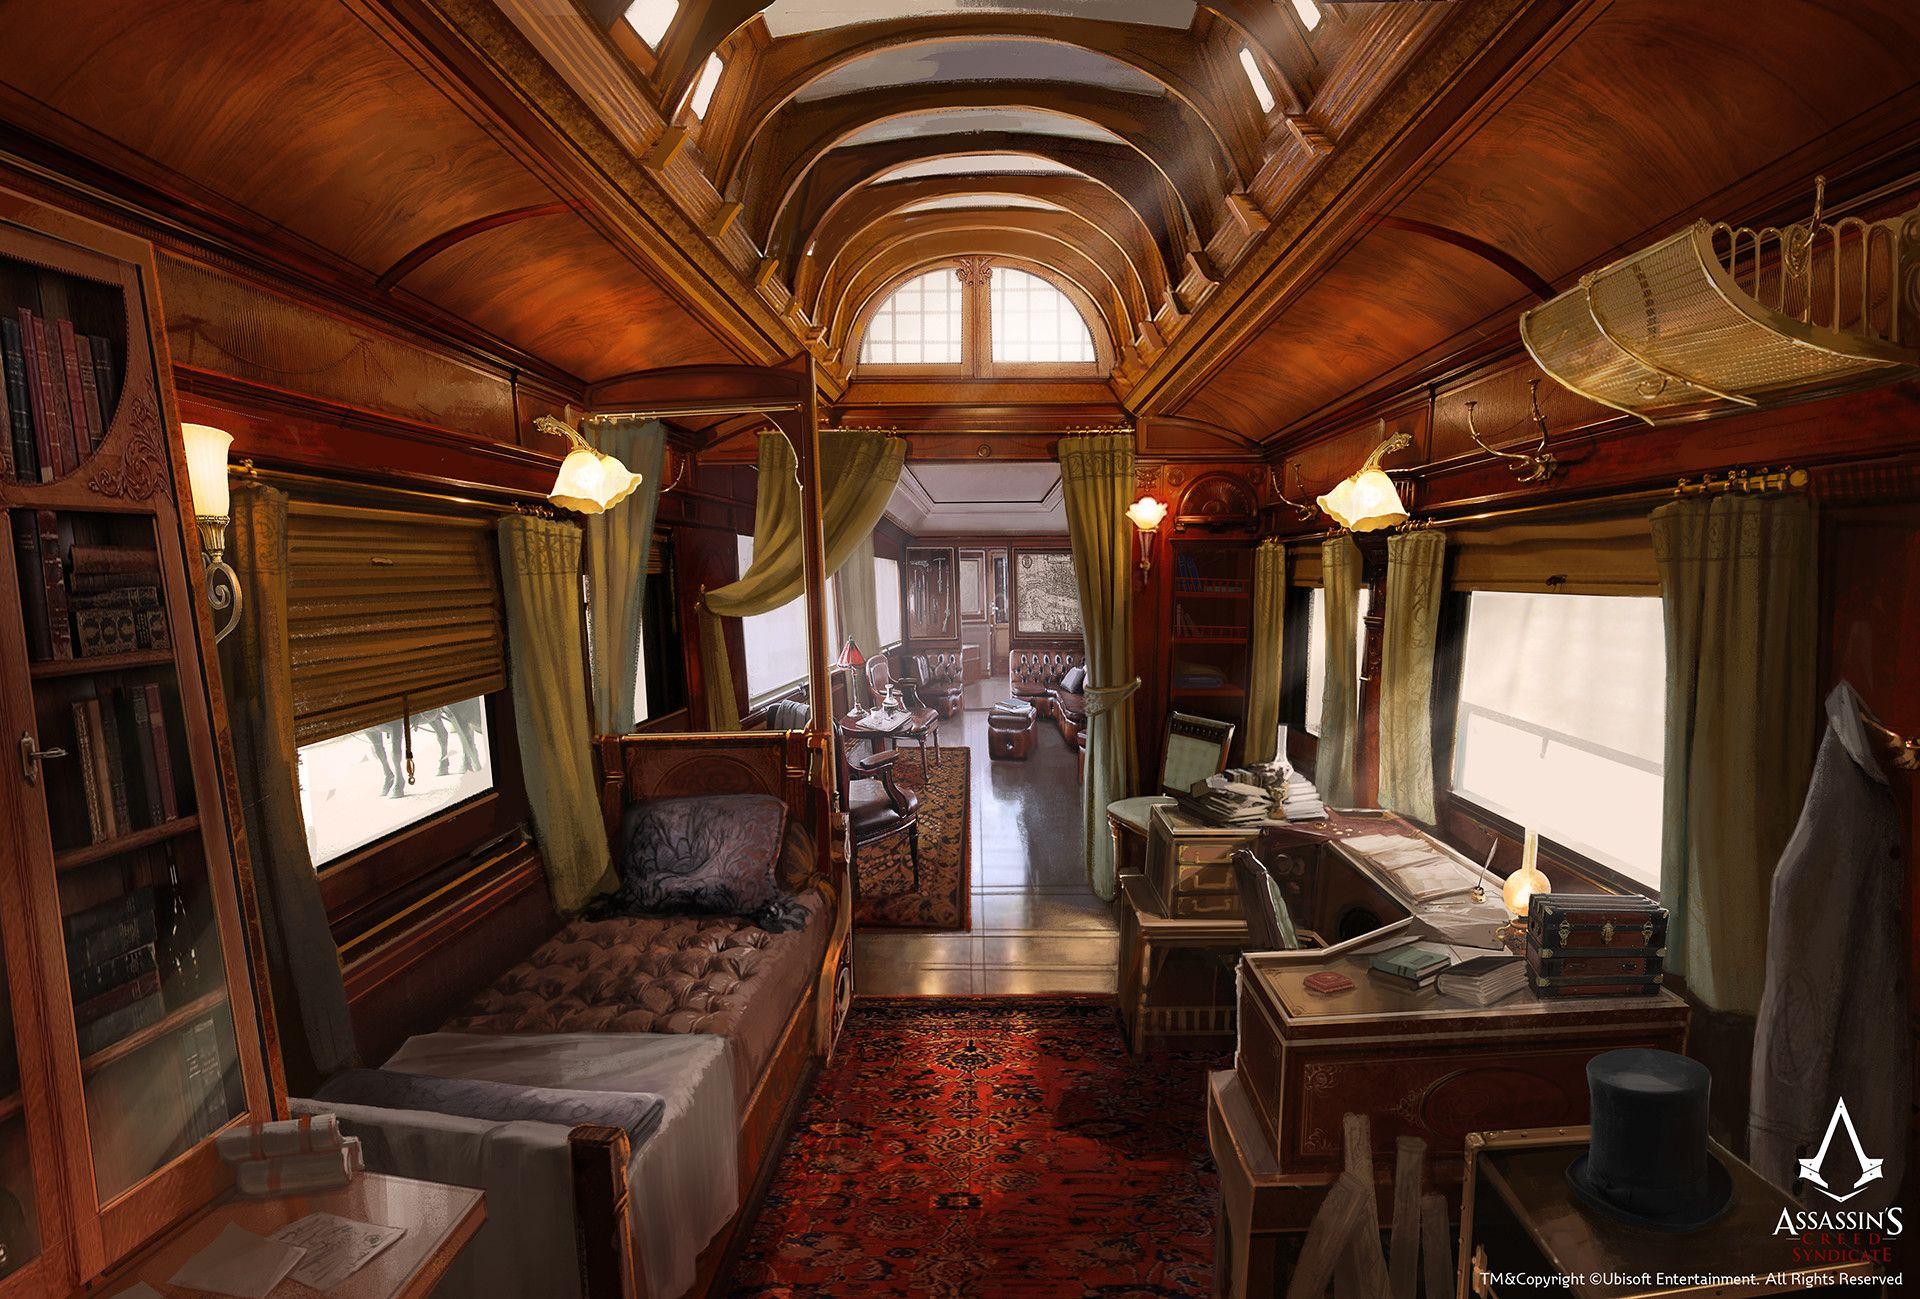 ArtStation - Assassin's Creed Syndicate /// Jacob's carriage, David Alvarez